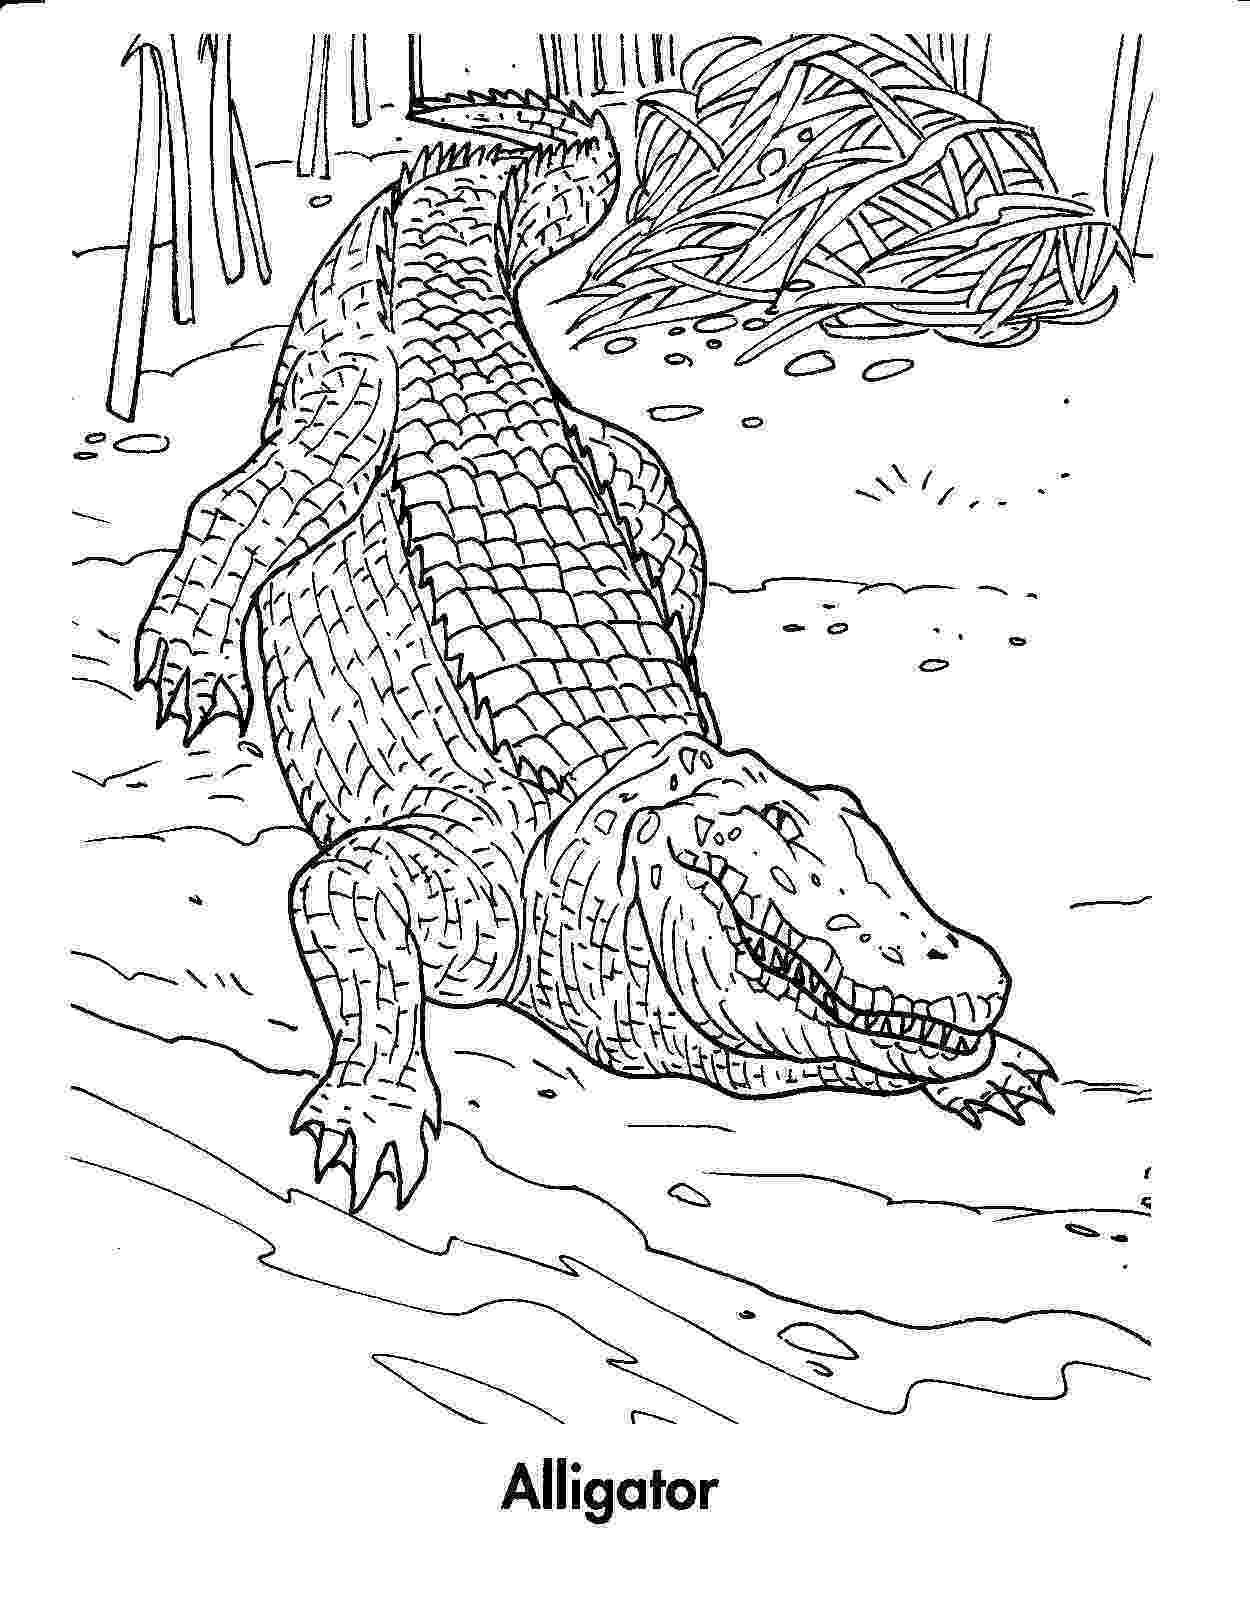 crocodile colouring page free printable crocodile coloring pages for kids colouring page crocodile